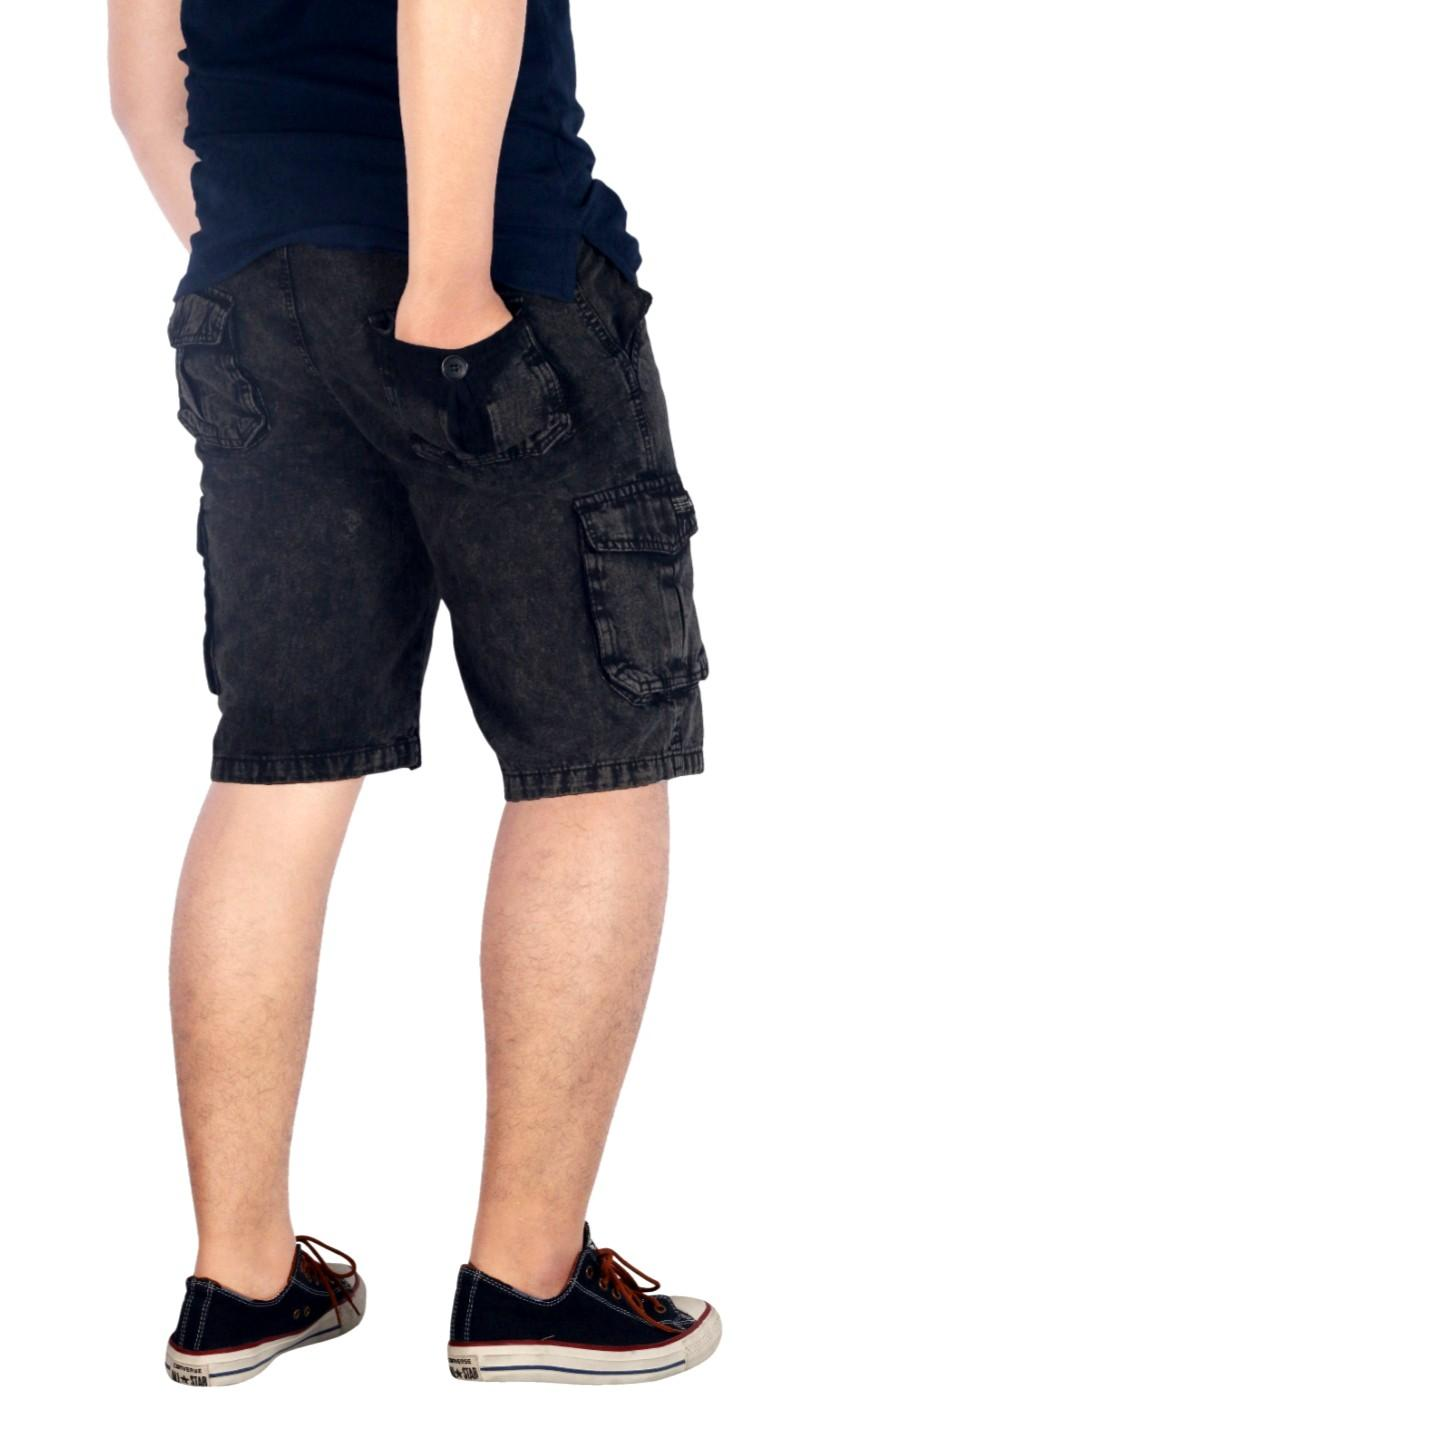 Bsg_Fashion1 Celana Pendek Hitam Polos Distro / Celana Skinny/Celana Pants/Celana Santai/Celana Casual/Celana Motif/Celana Polos/Celana Pria/Celana Cino/Celana Pantai/Celana Denim/Celana Jeans / CELANA JEANS KARGO /CELANA KARGO AN 5573 5574 5576 5575 - 2